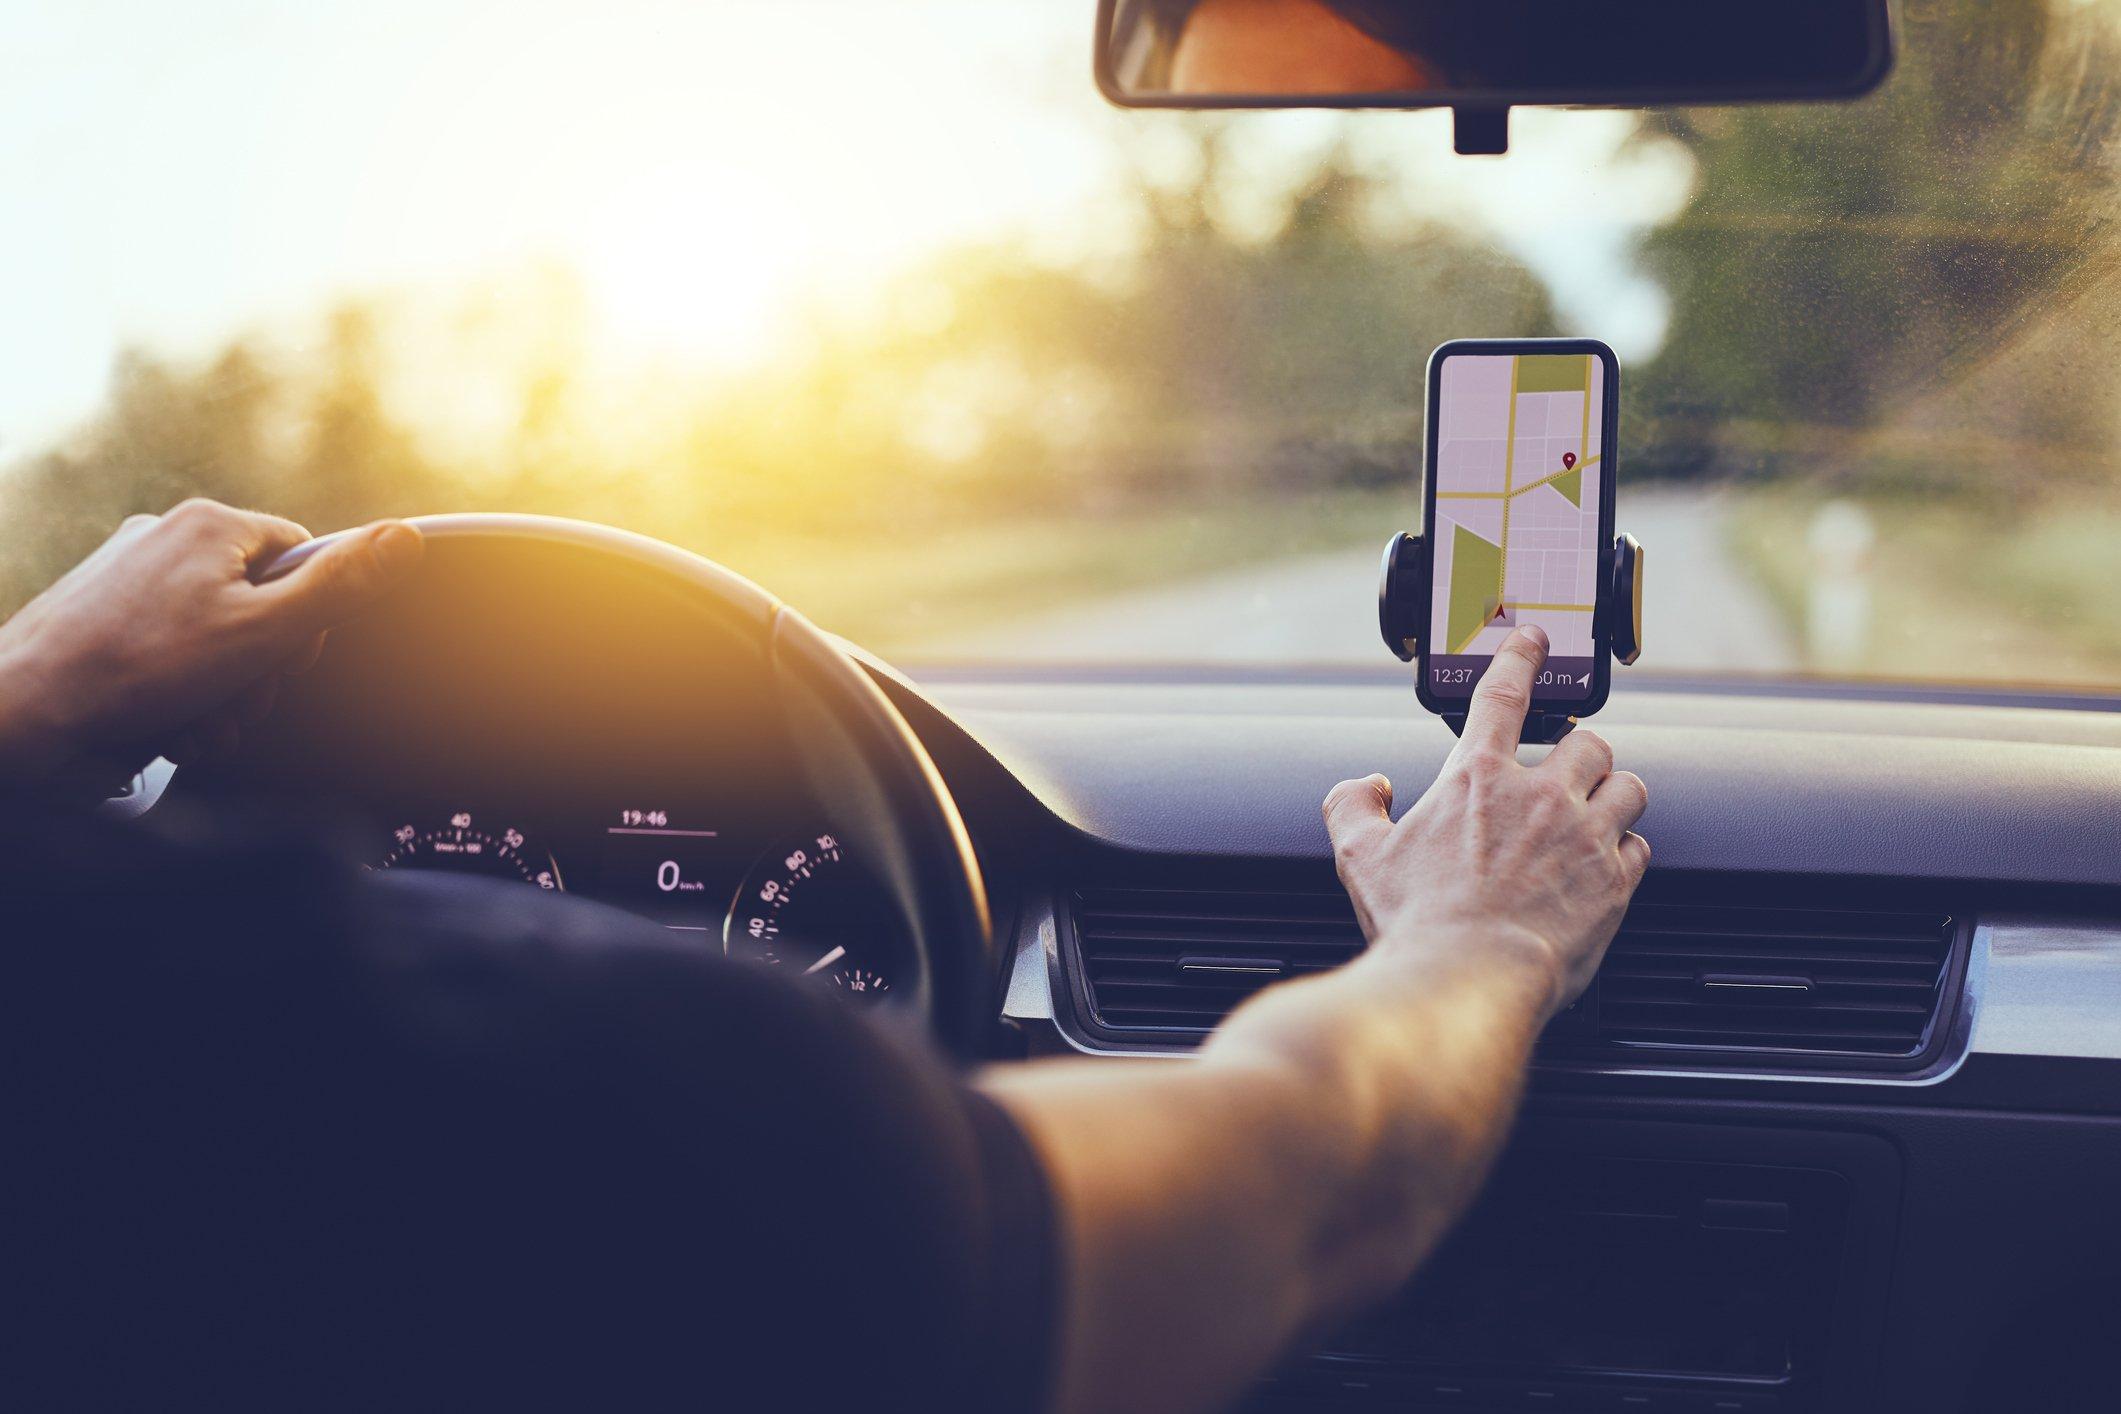 TomTom Speed Camera informing GPS